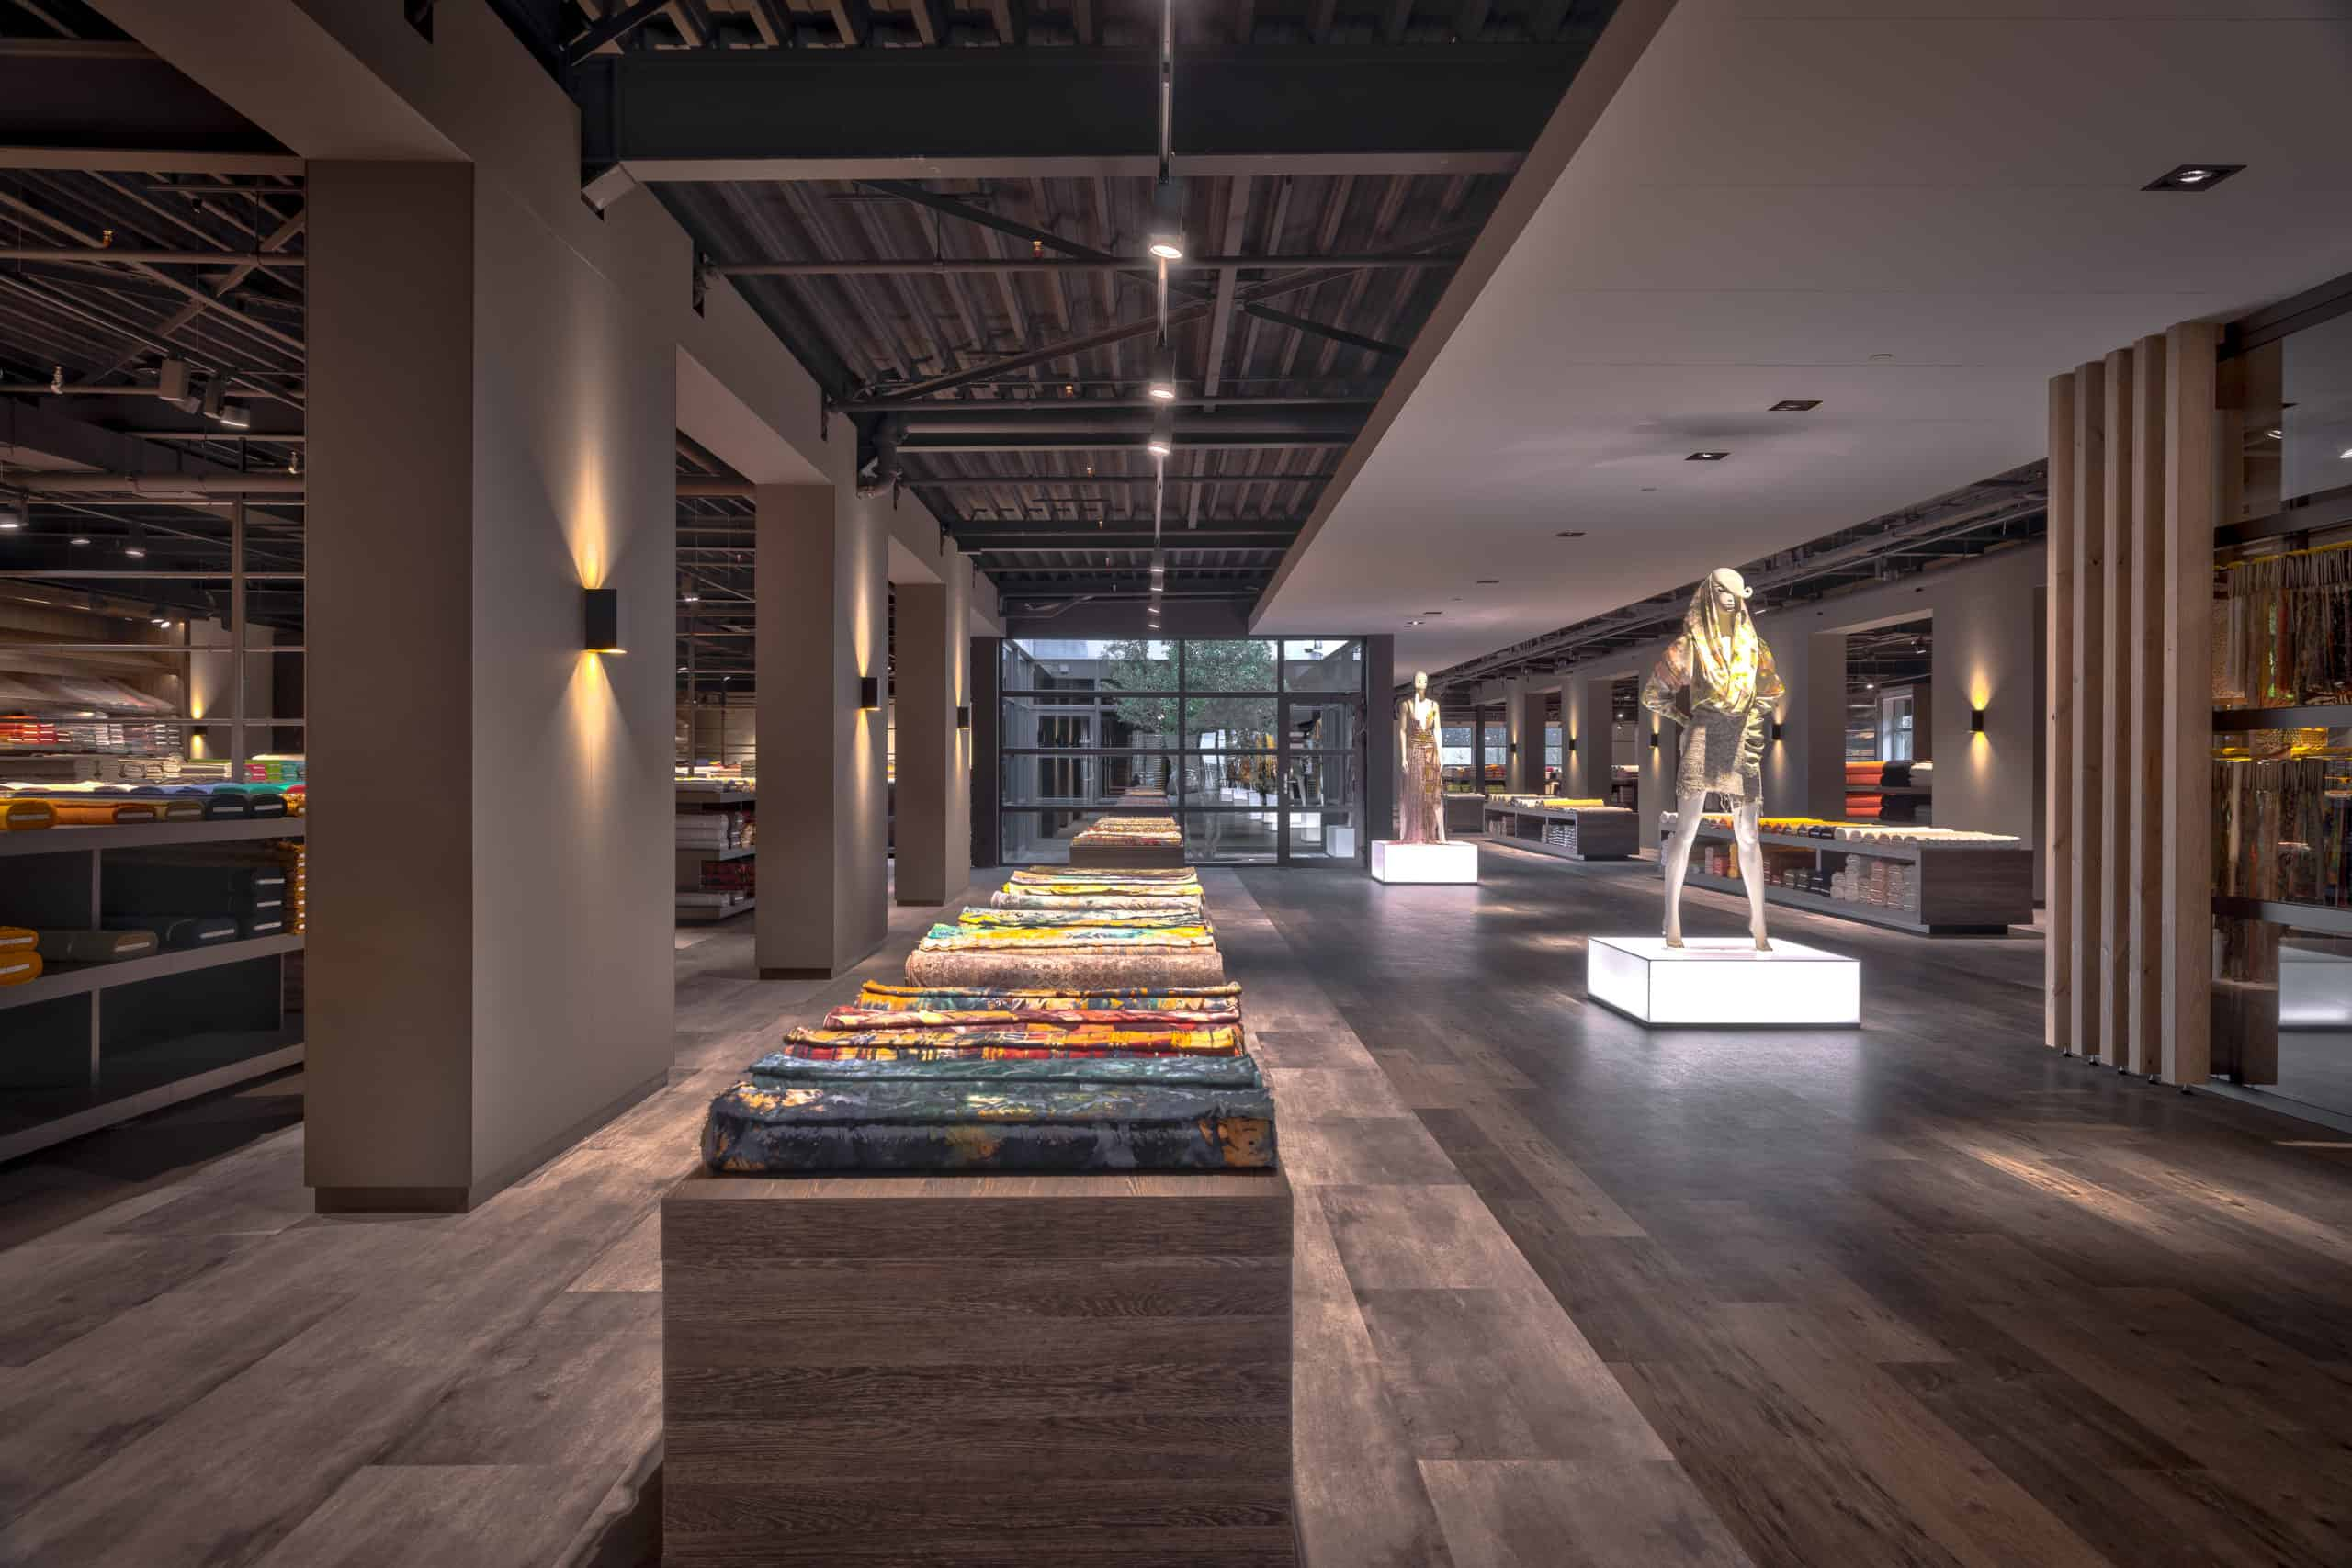 interieurarchitect Wildenberg ontwerp showroom Knipidee Almere entree deur wsb maretti iboma kerastone objectflor tarkett kopie